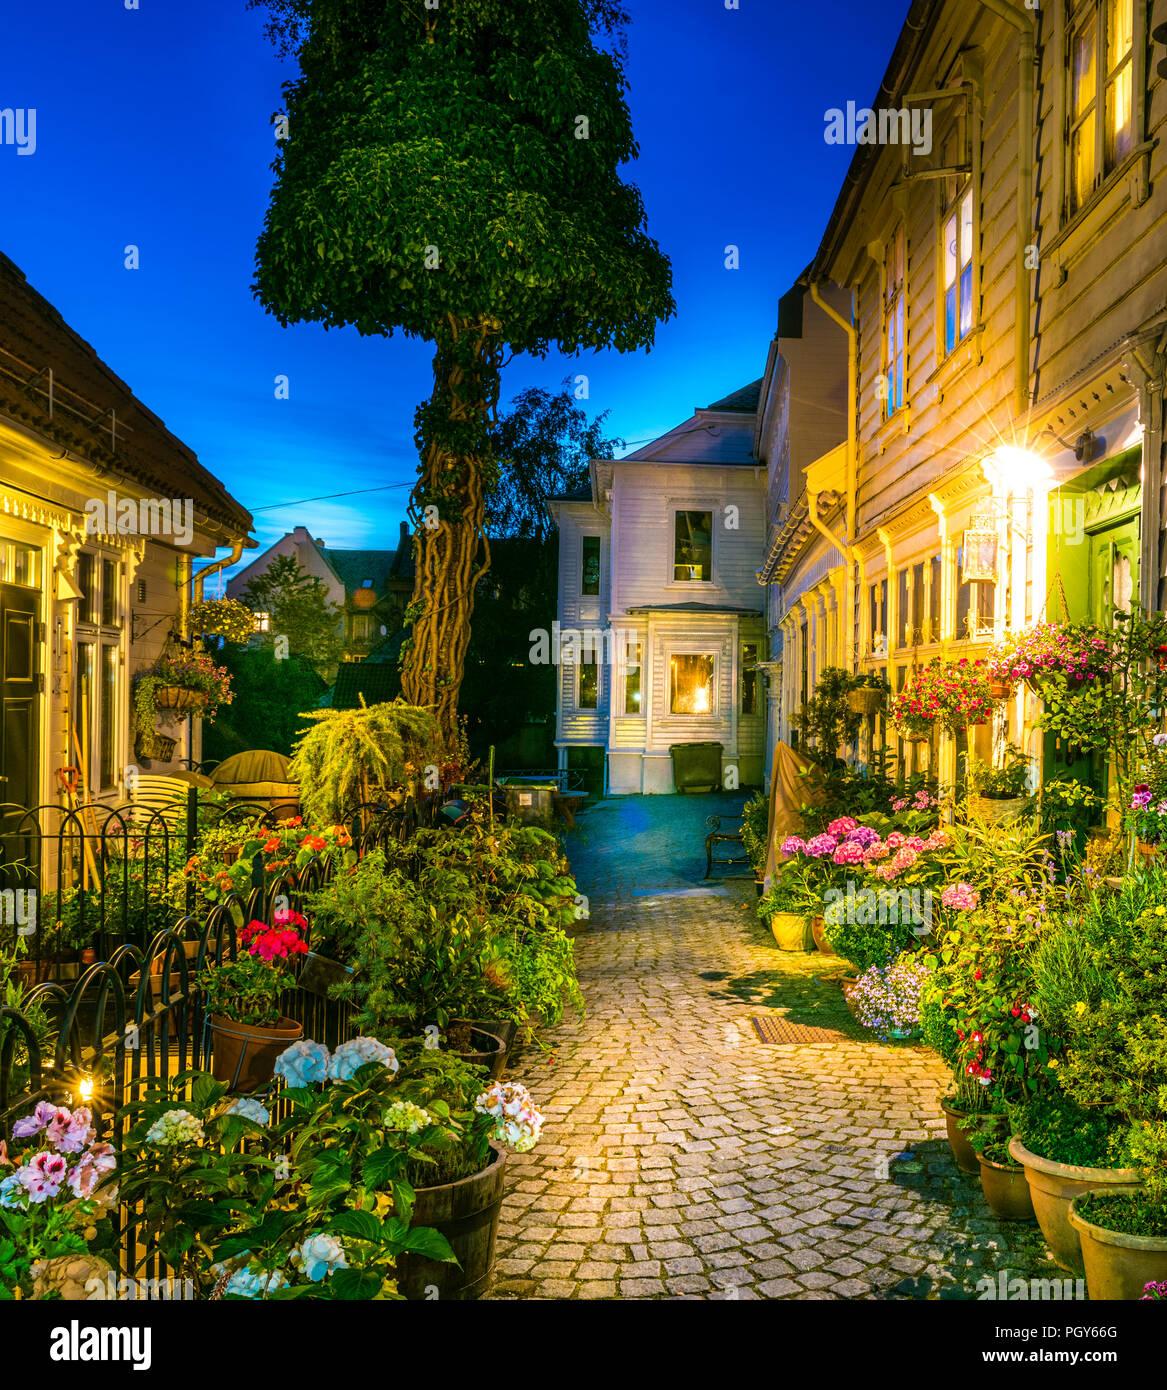 Krybbesmauet in Bergen, Western Norway - Stock Image